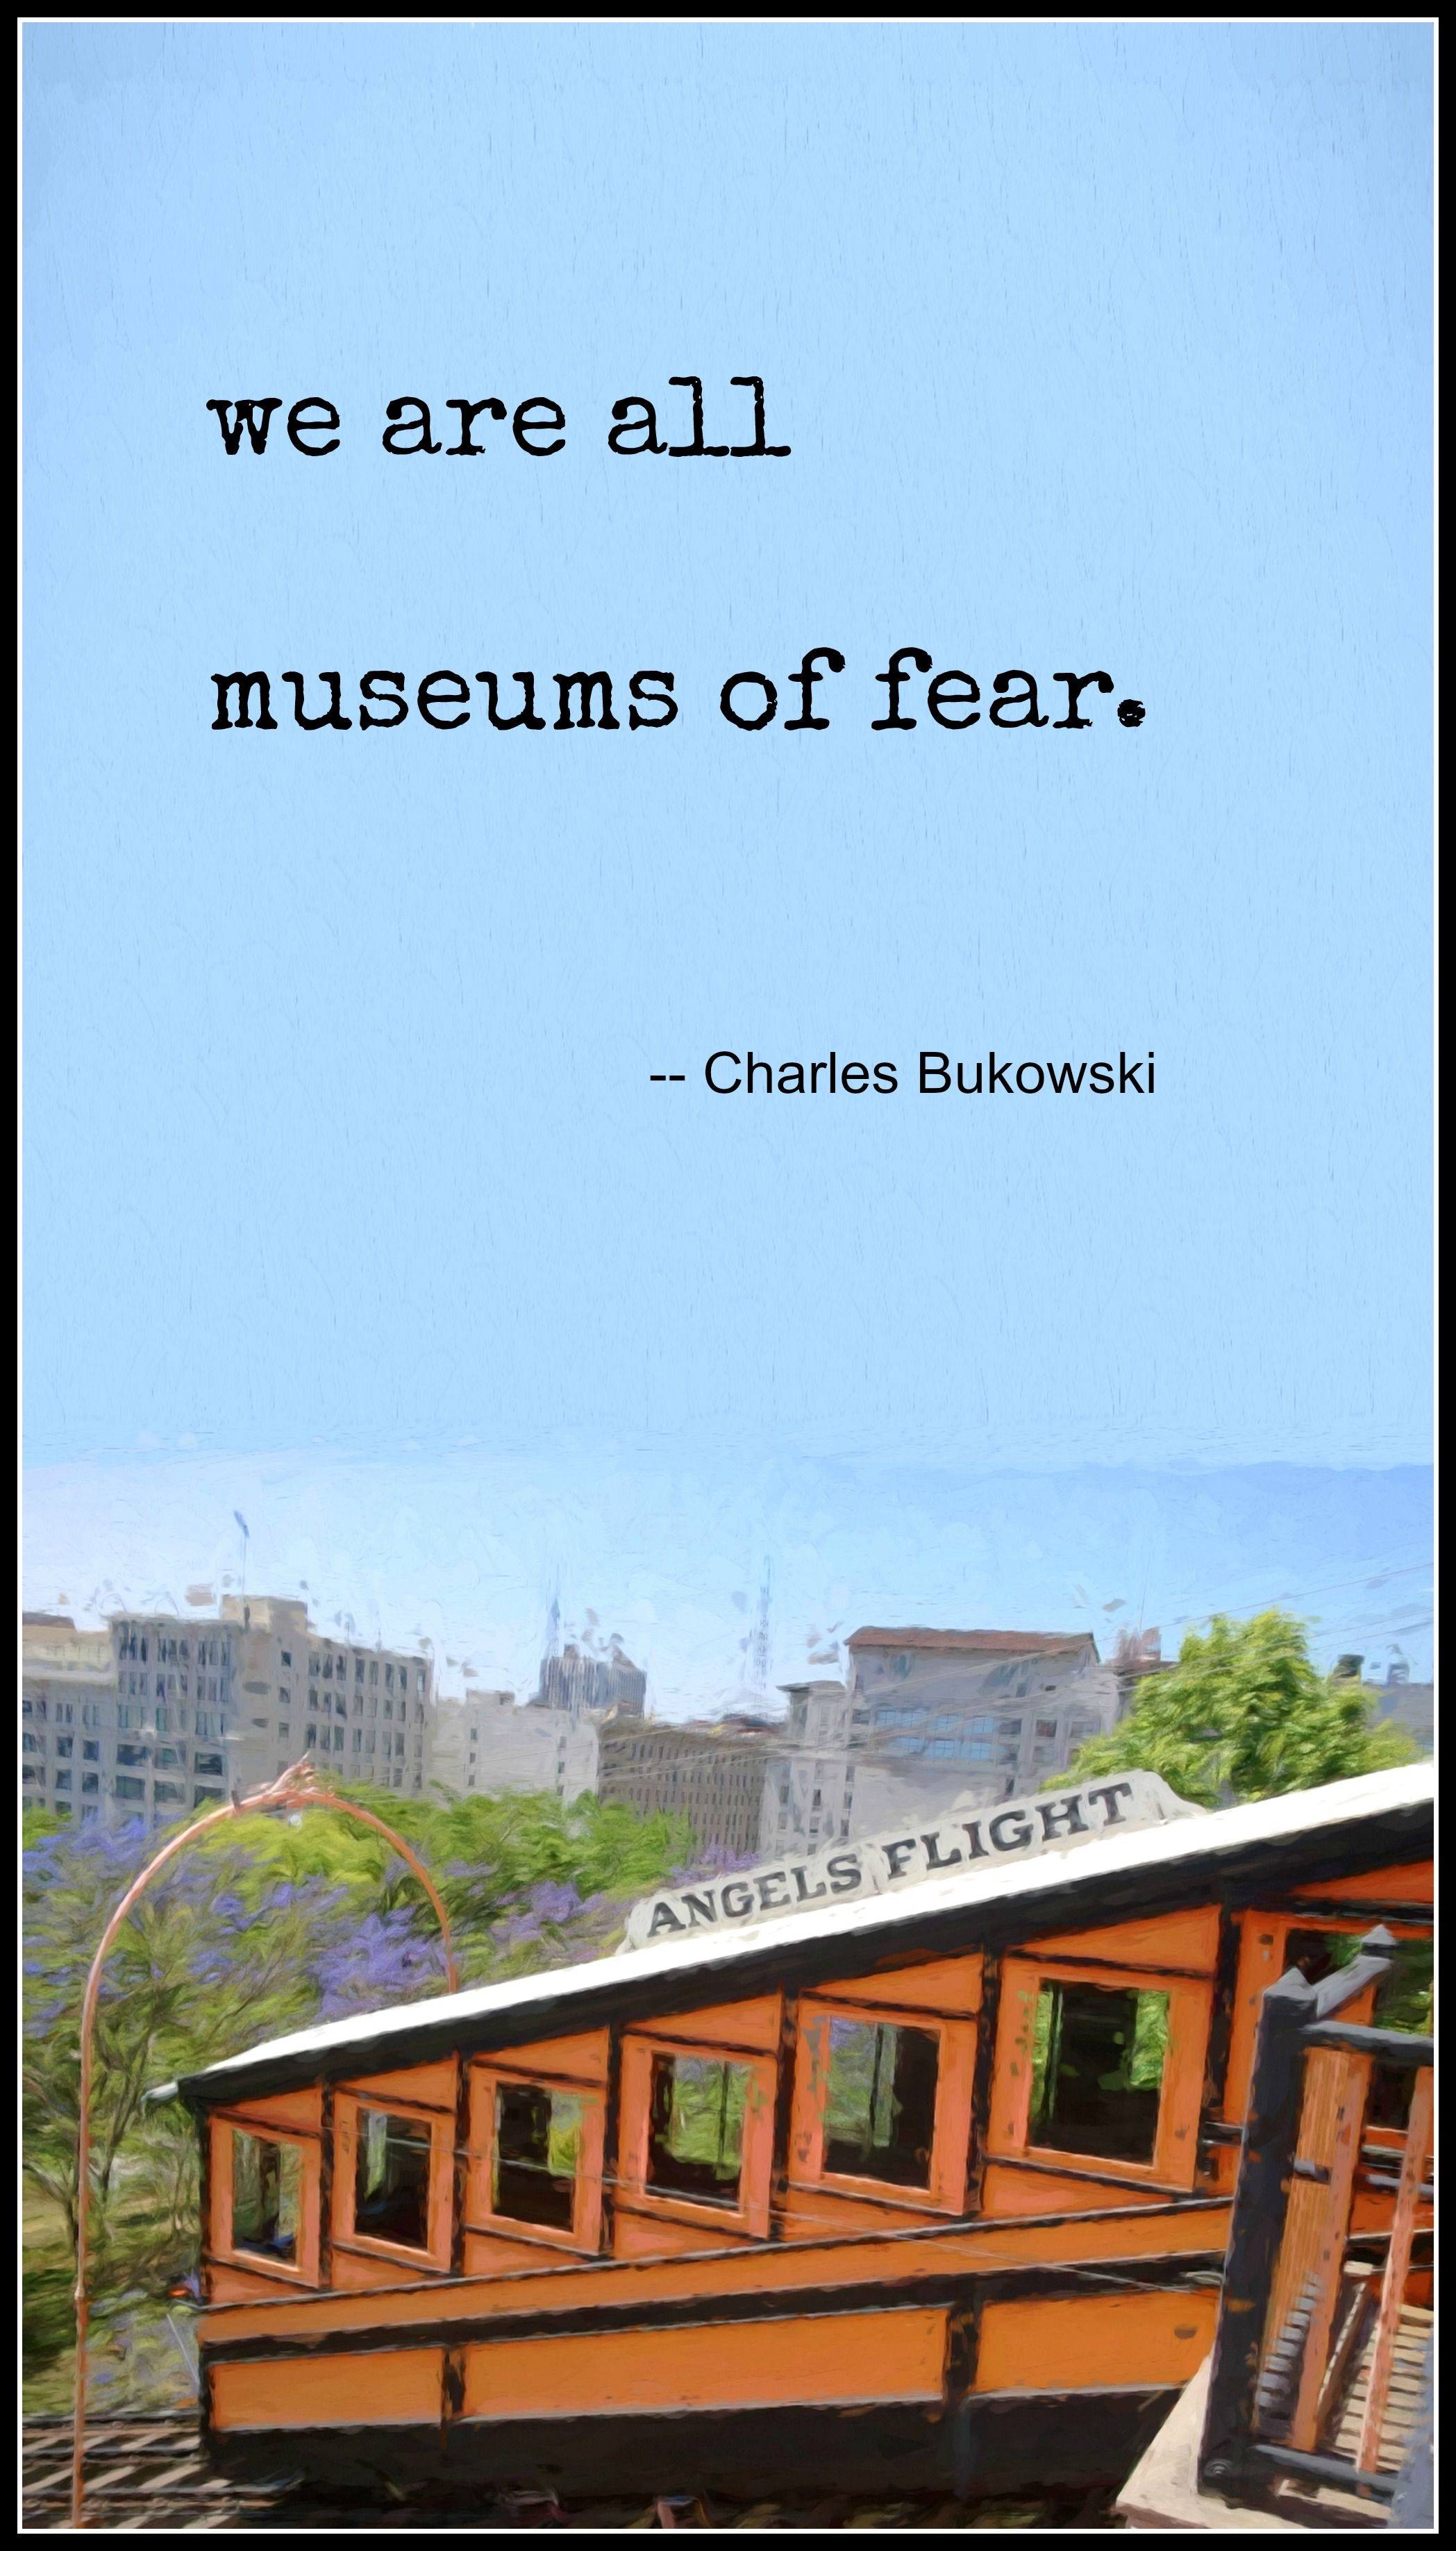 Charles Bukowski Boring Life Quote Poet Novelist Short Story Writer Poster Photo